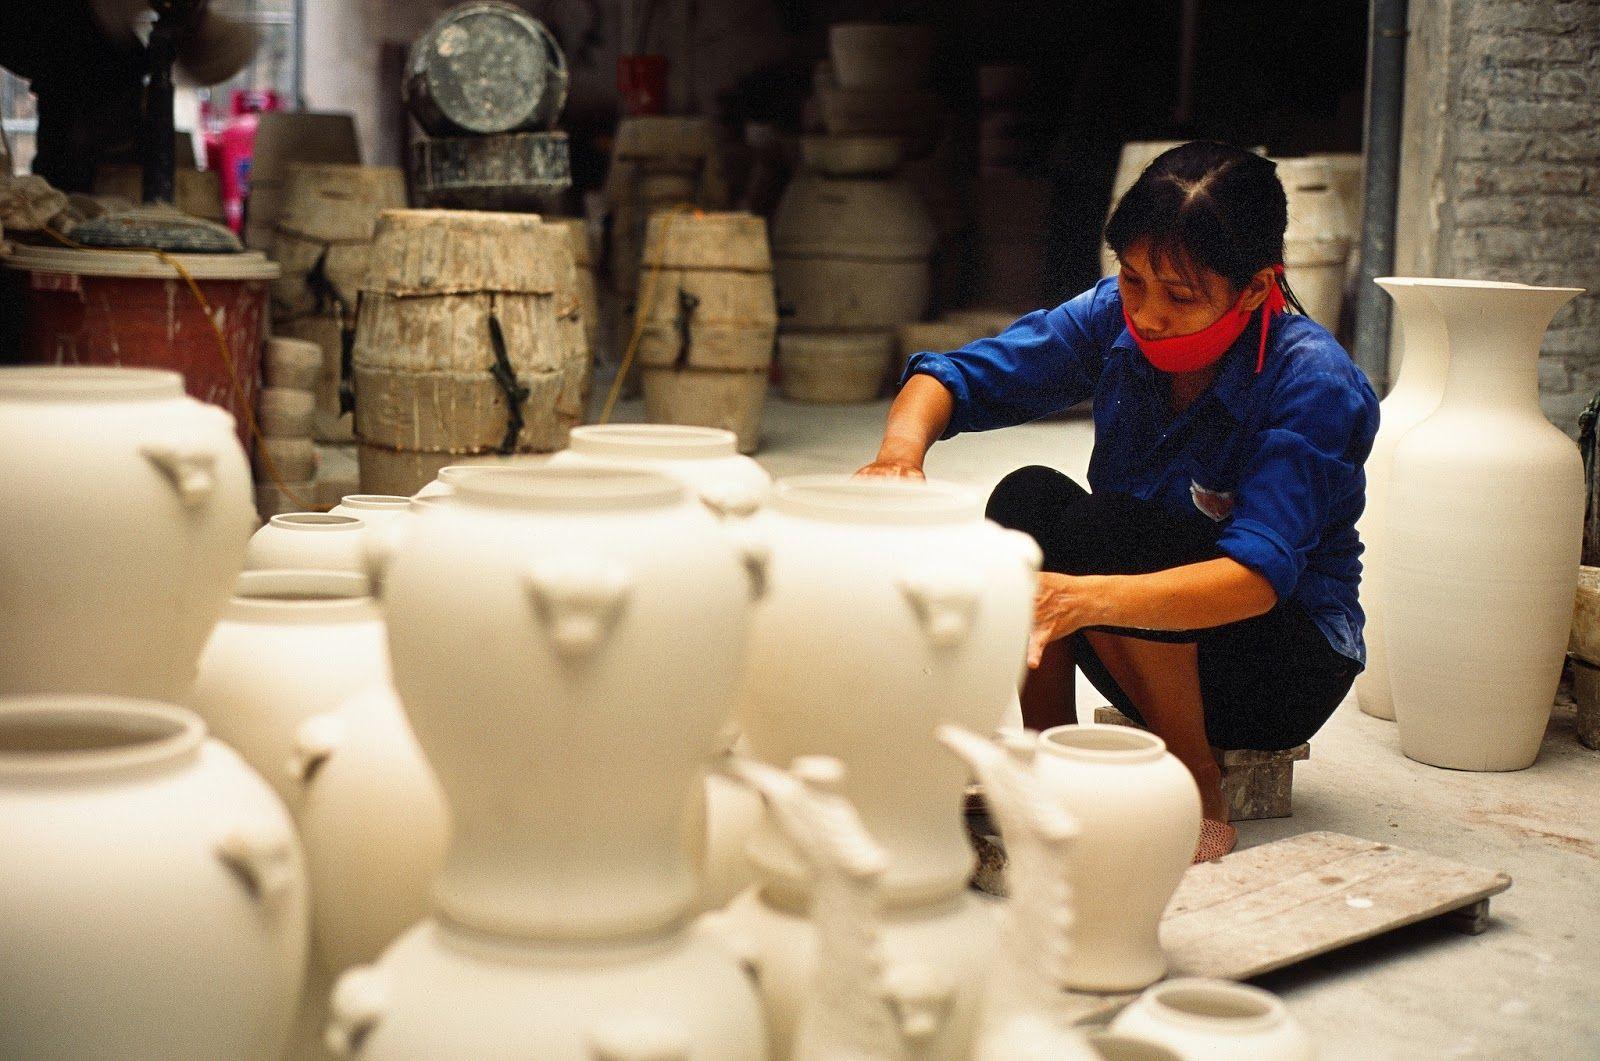 Bat Trang Ceramic Village - Traditional Handicraft Villages in Hanoi